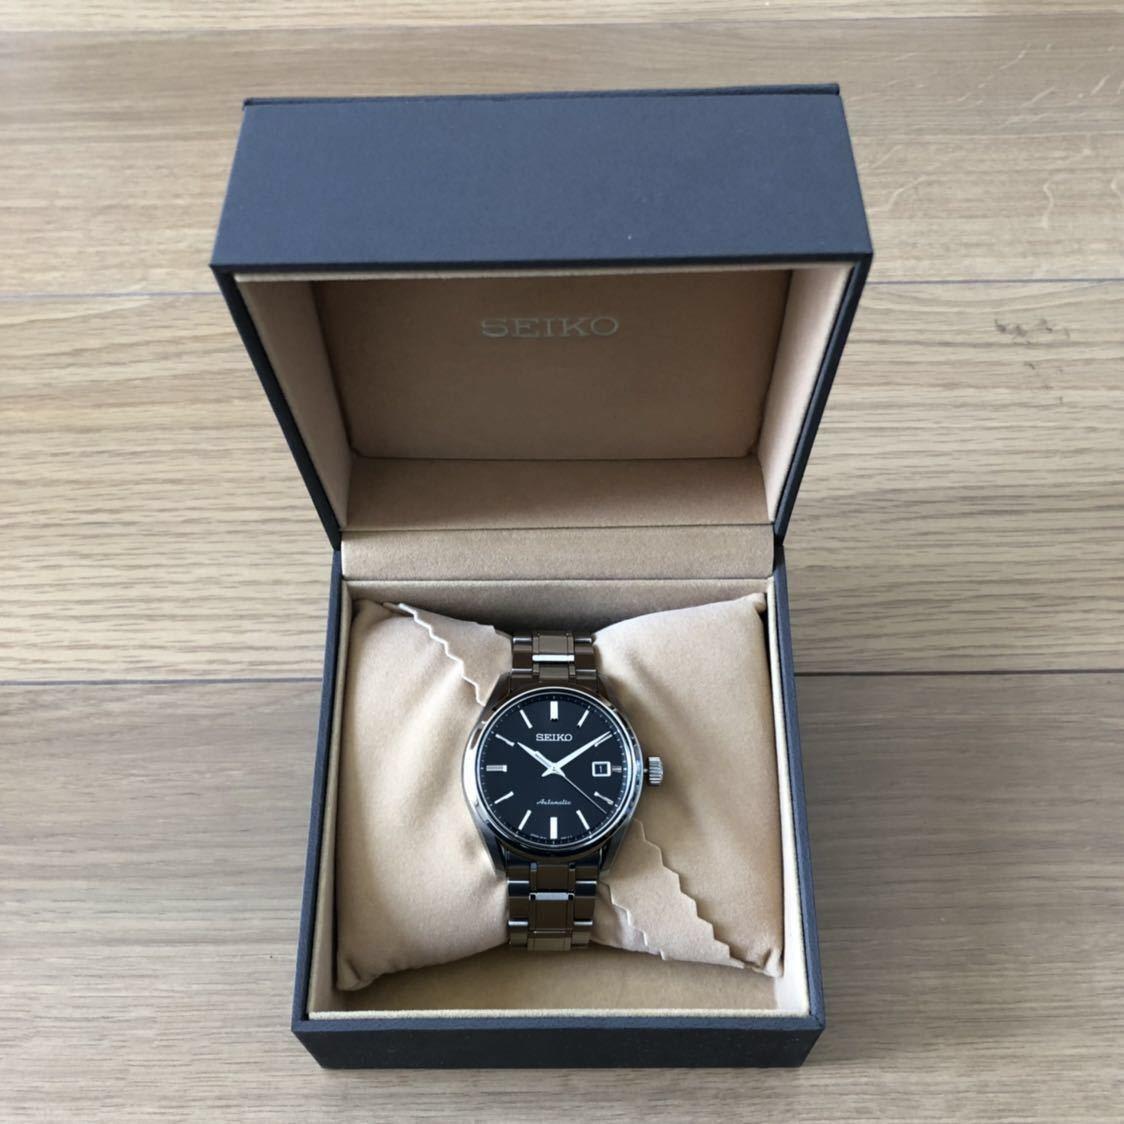 SEIKO PRESAGE SARX035 セイコー プレザージュ 機械式 メカニカル 腕時計 自動巻